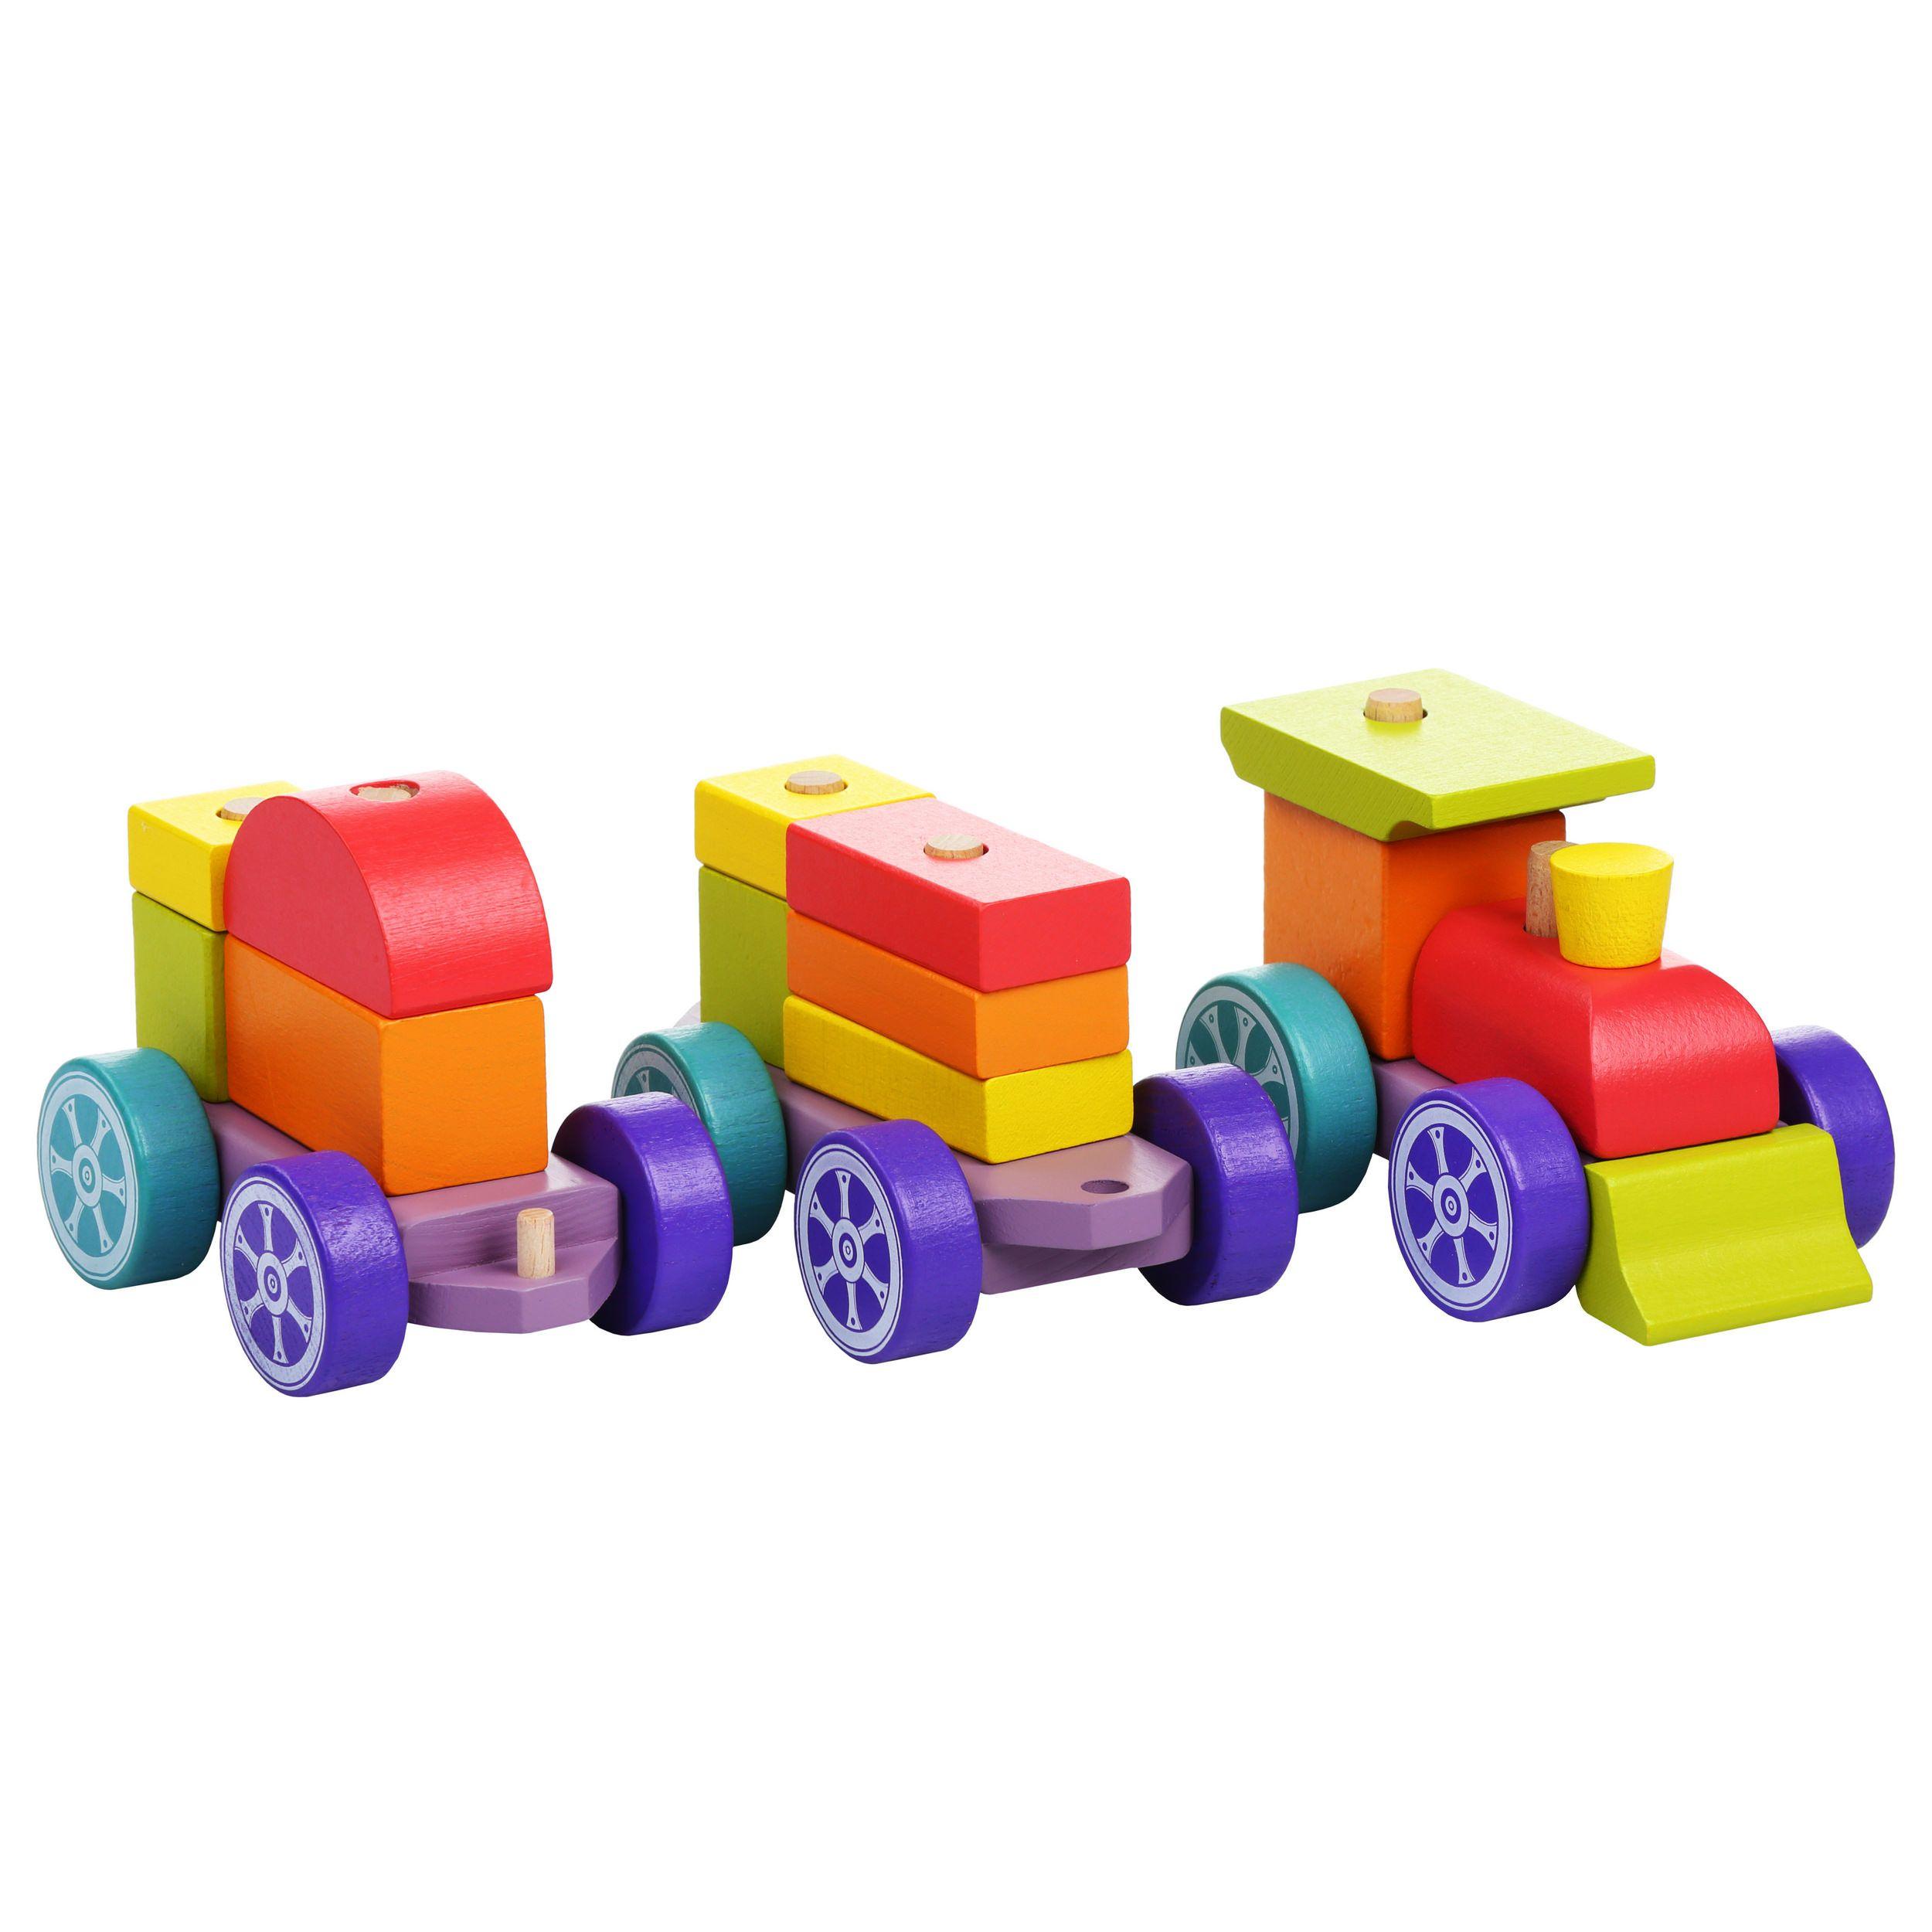 Jucarie Din Lemn Cubika, Trenulet imagine